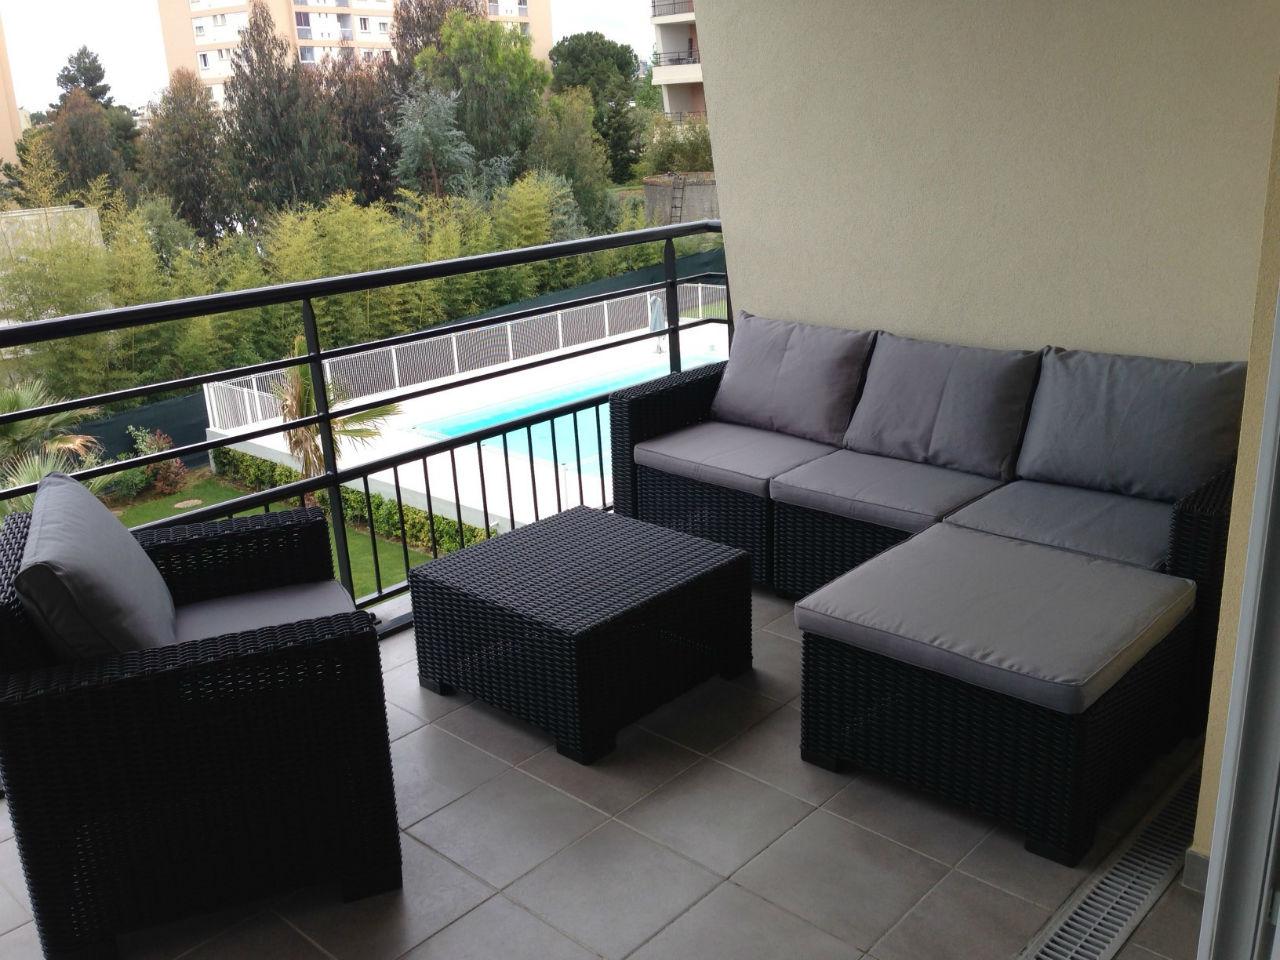 Petit Salon De Jardin Pour Balcon Luxe Salon Terrasse